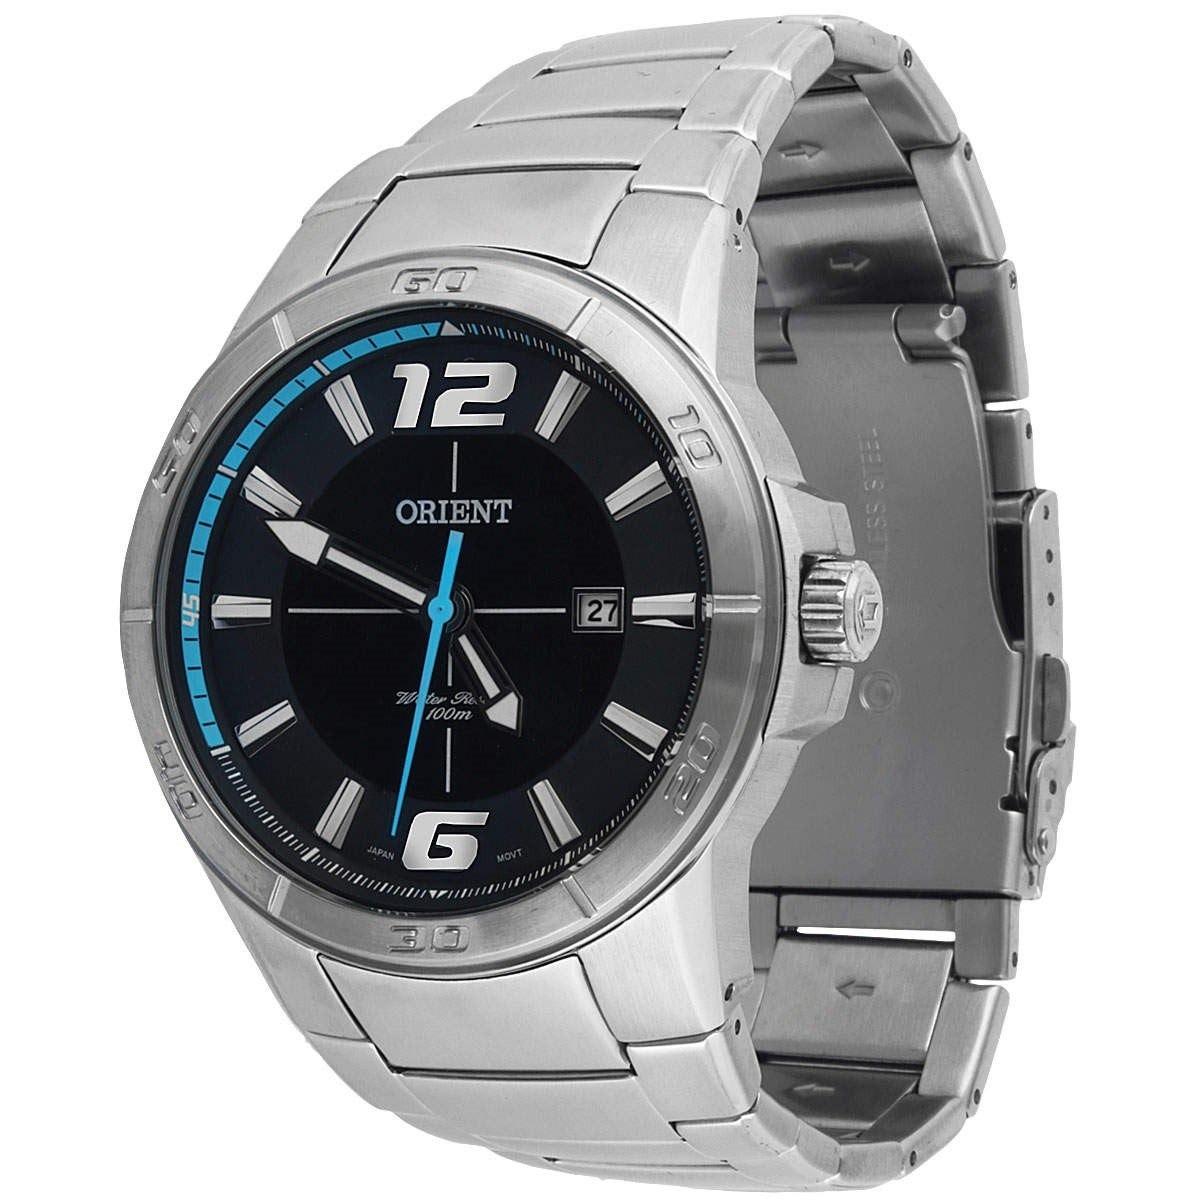 ba3157affa1 relógio orient mbss1249 mostrador preto masculino 100m. Carregando zoom.